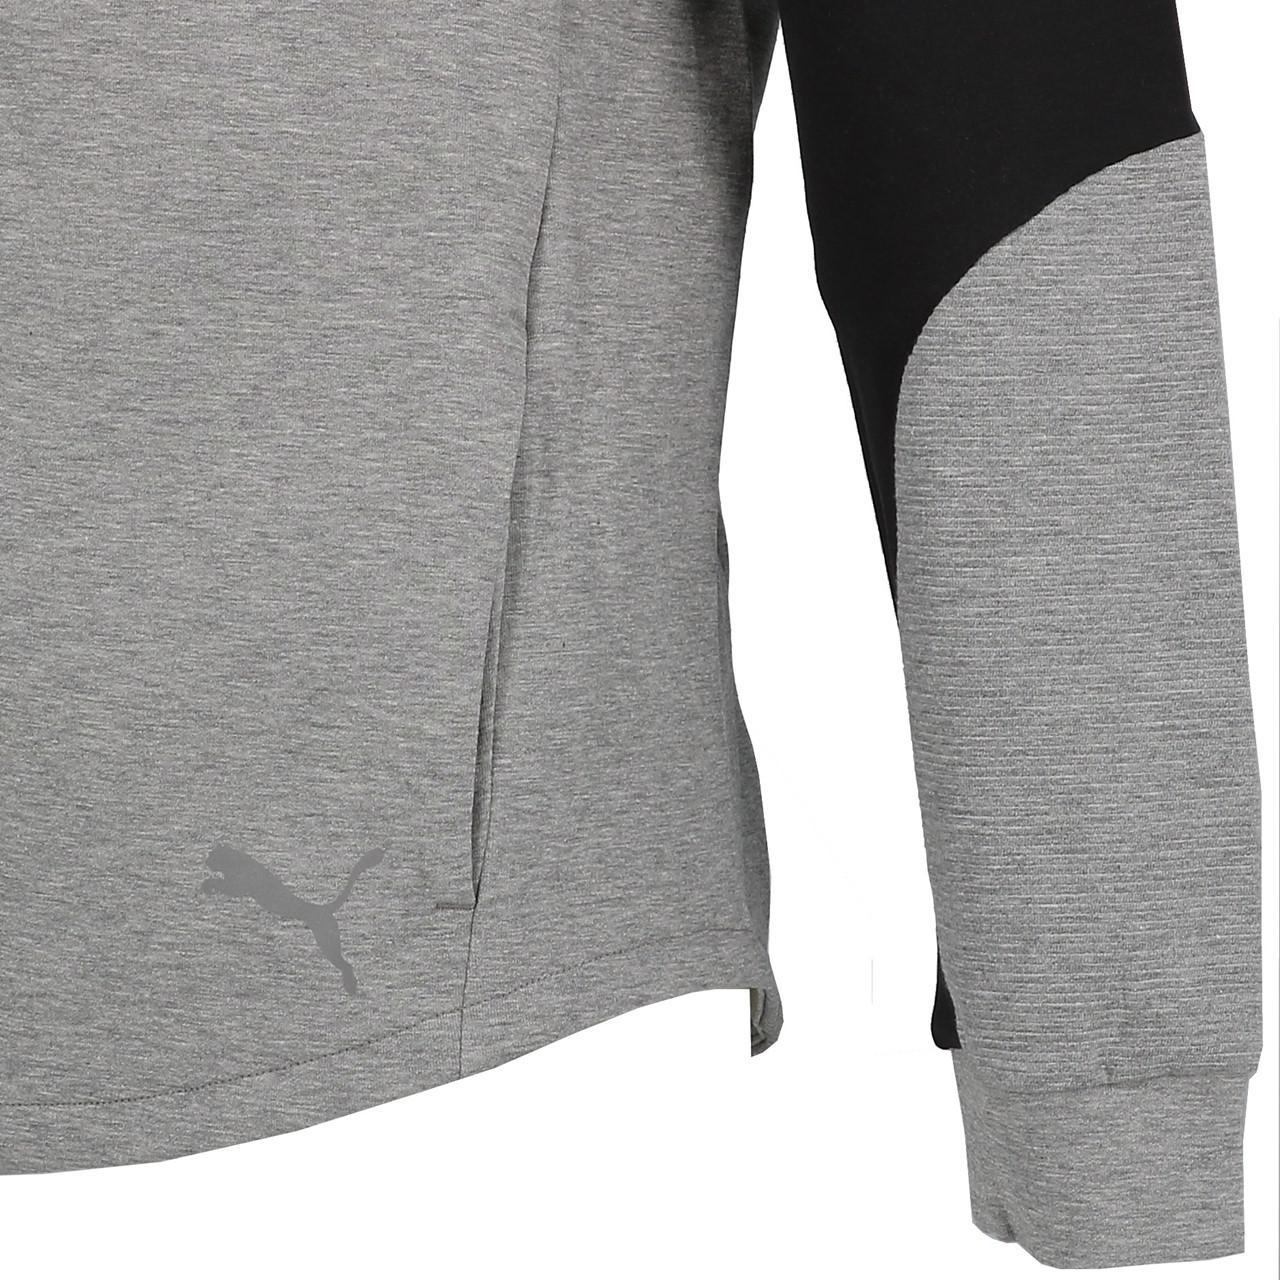 Jacken-Sweatshirts-Zipped-Kapuze-Puma-Evostripe-Anc-Fzcap-Sw-Jr-Grau-25708-Neu Indexbild 3